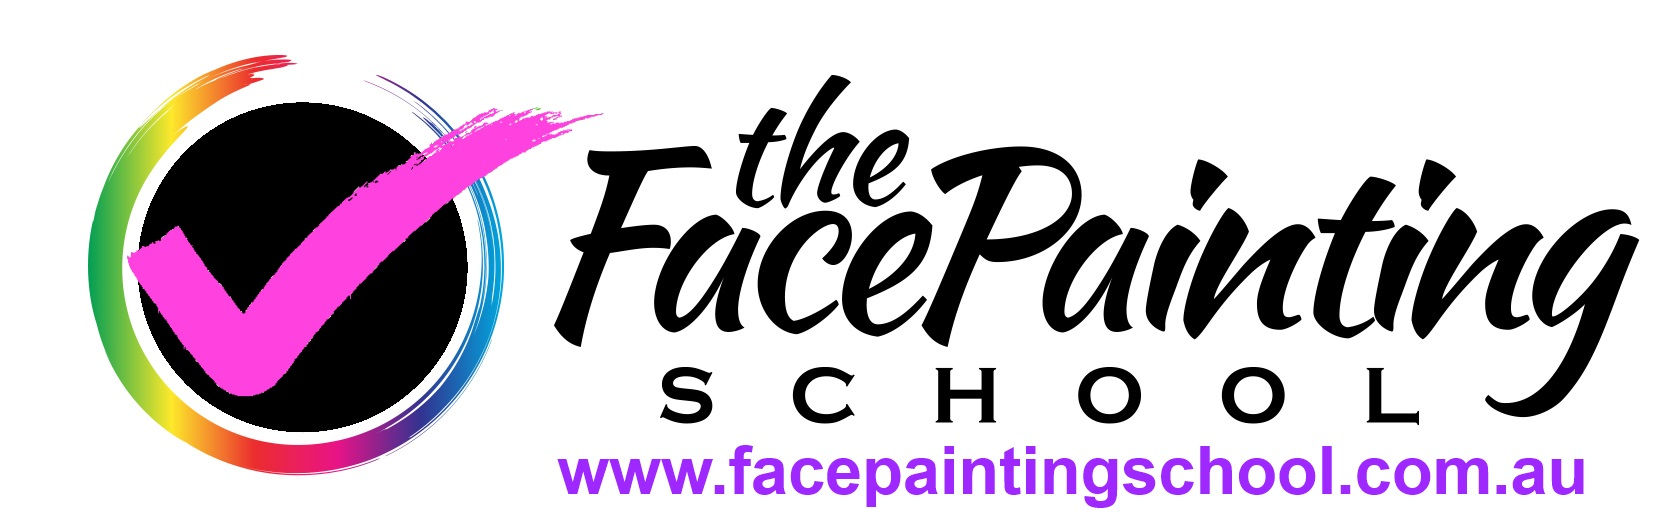 fps-logo-final-may-2014.jpg